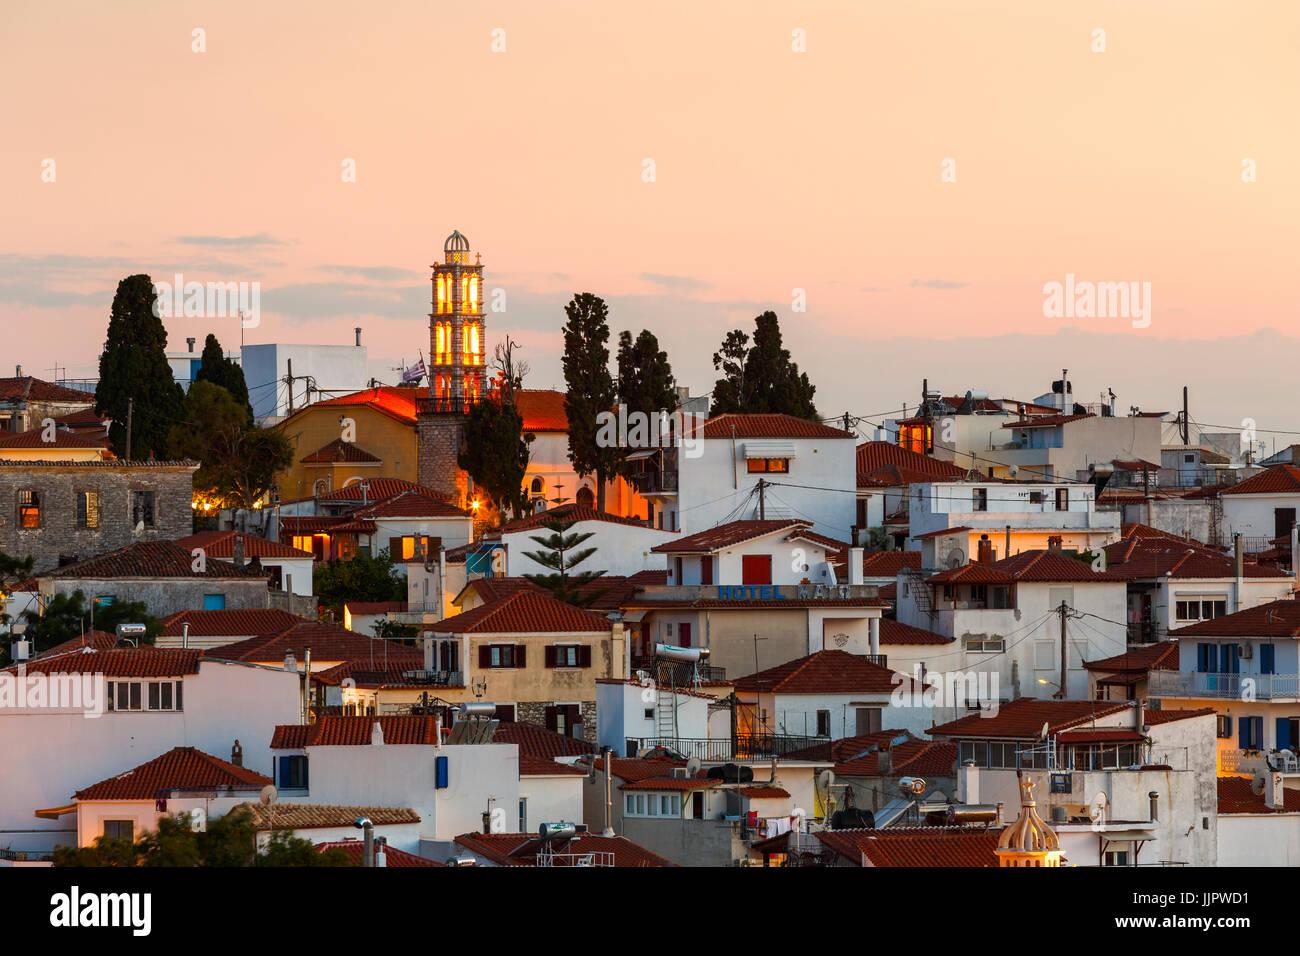 Evening view of Skiathos town in Sporades, Greece. - Stock Image